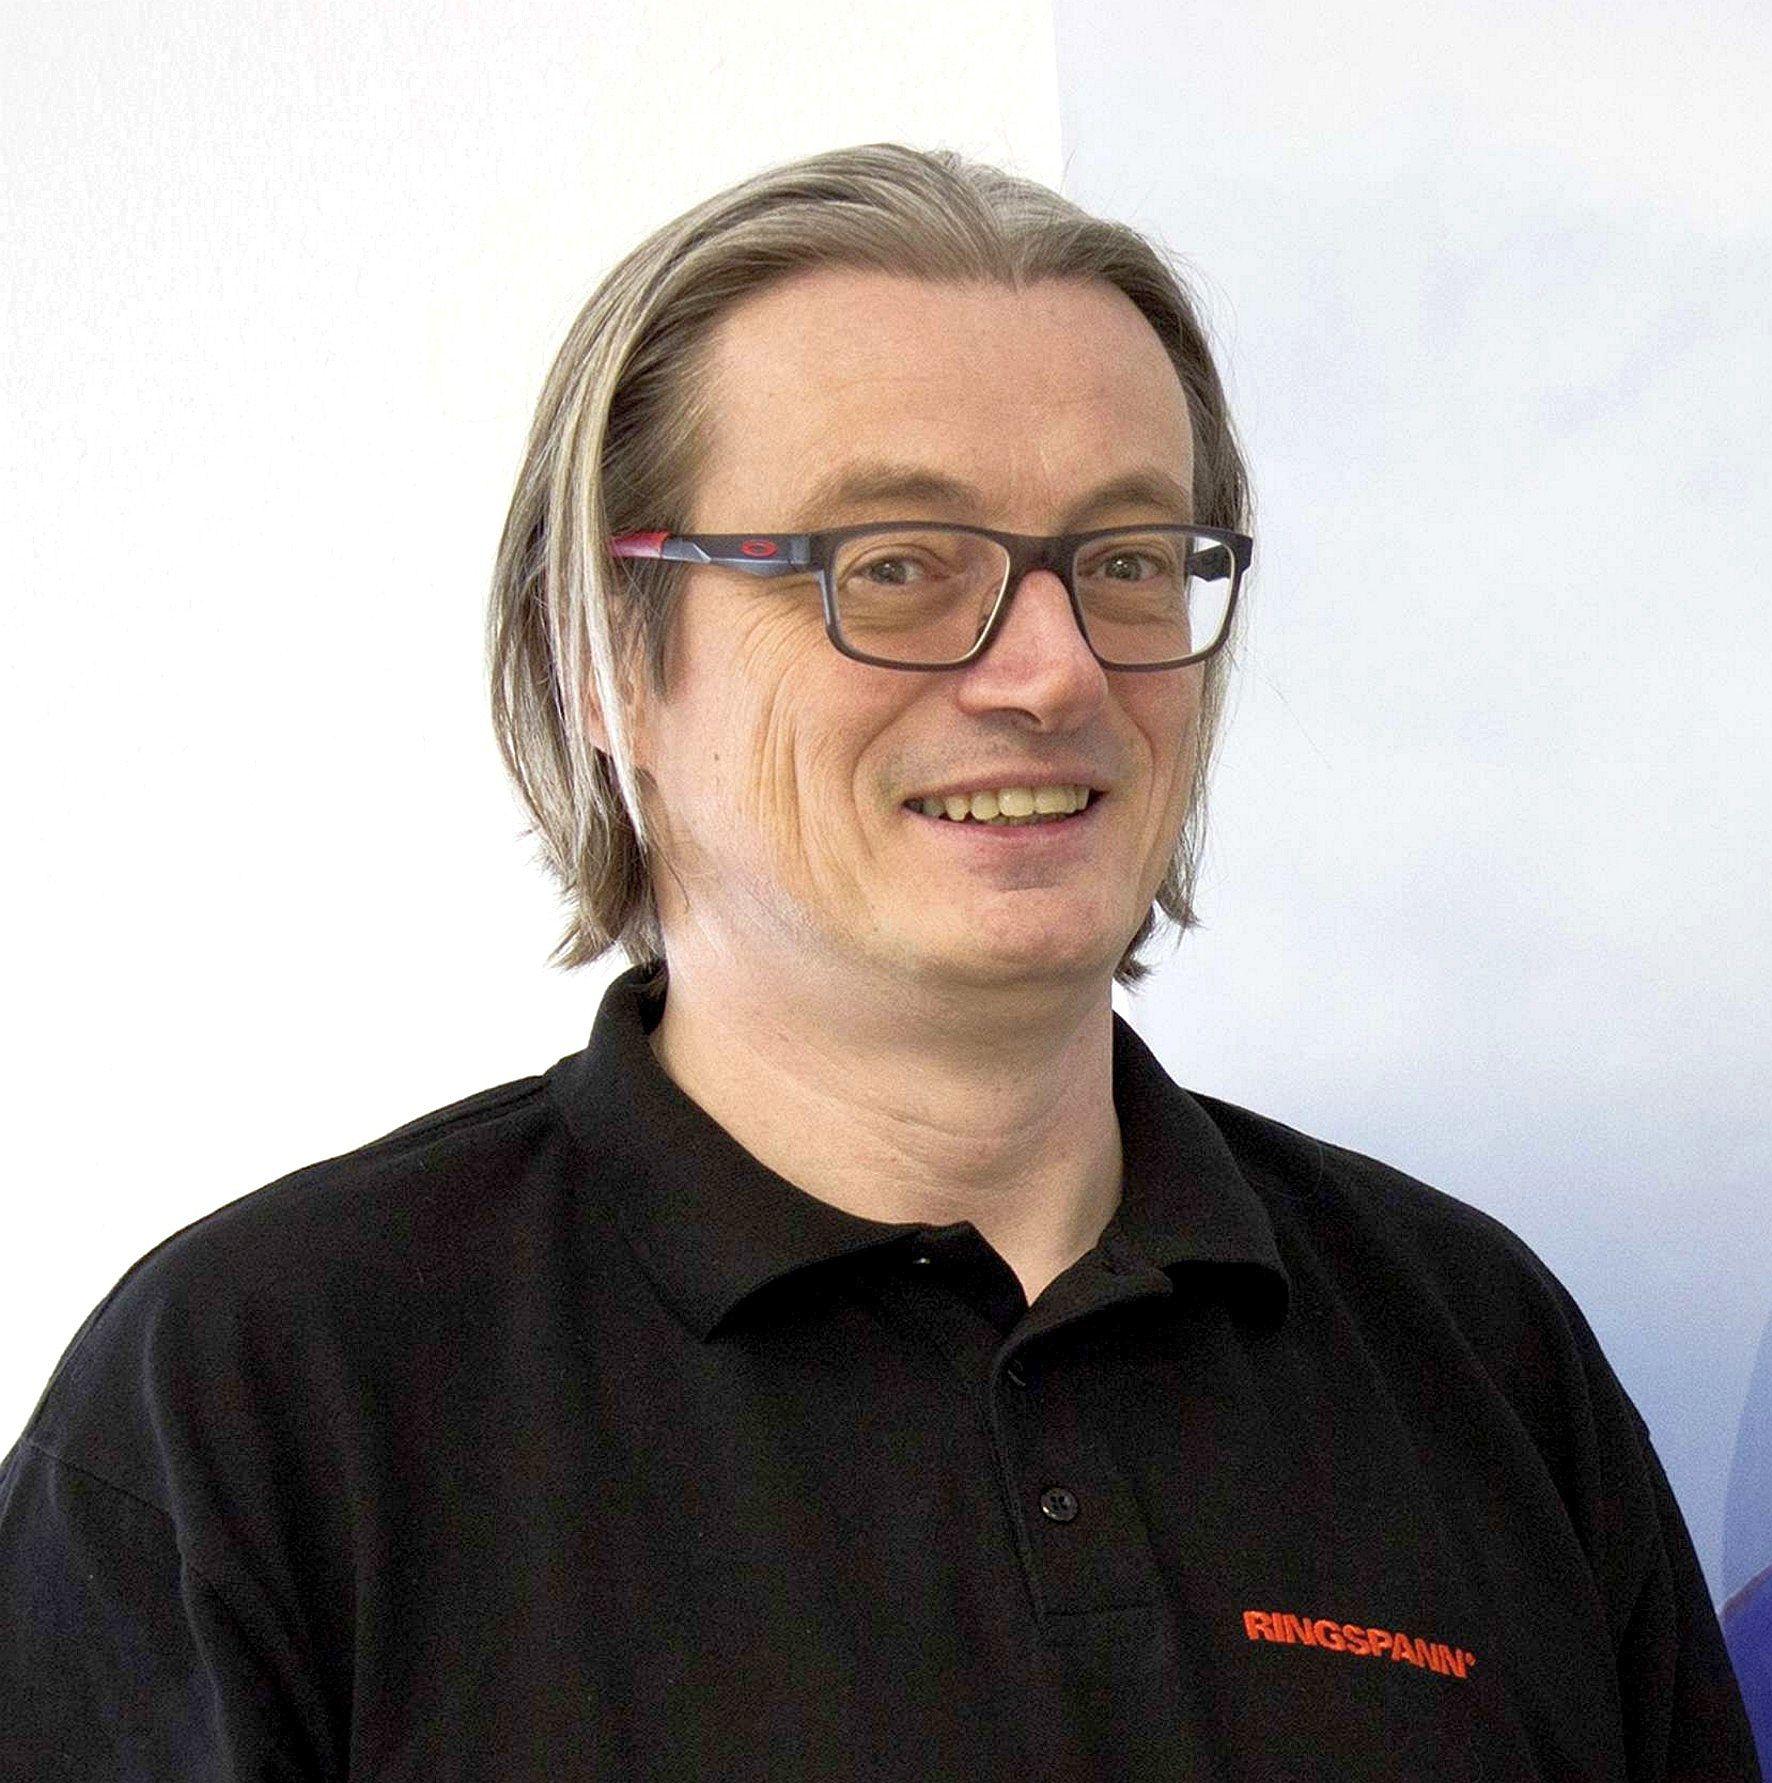 RINGSPANN division manager Thomas Heubach